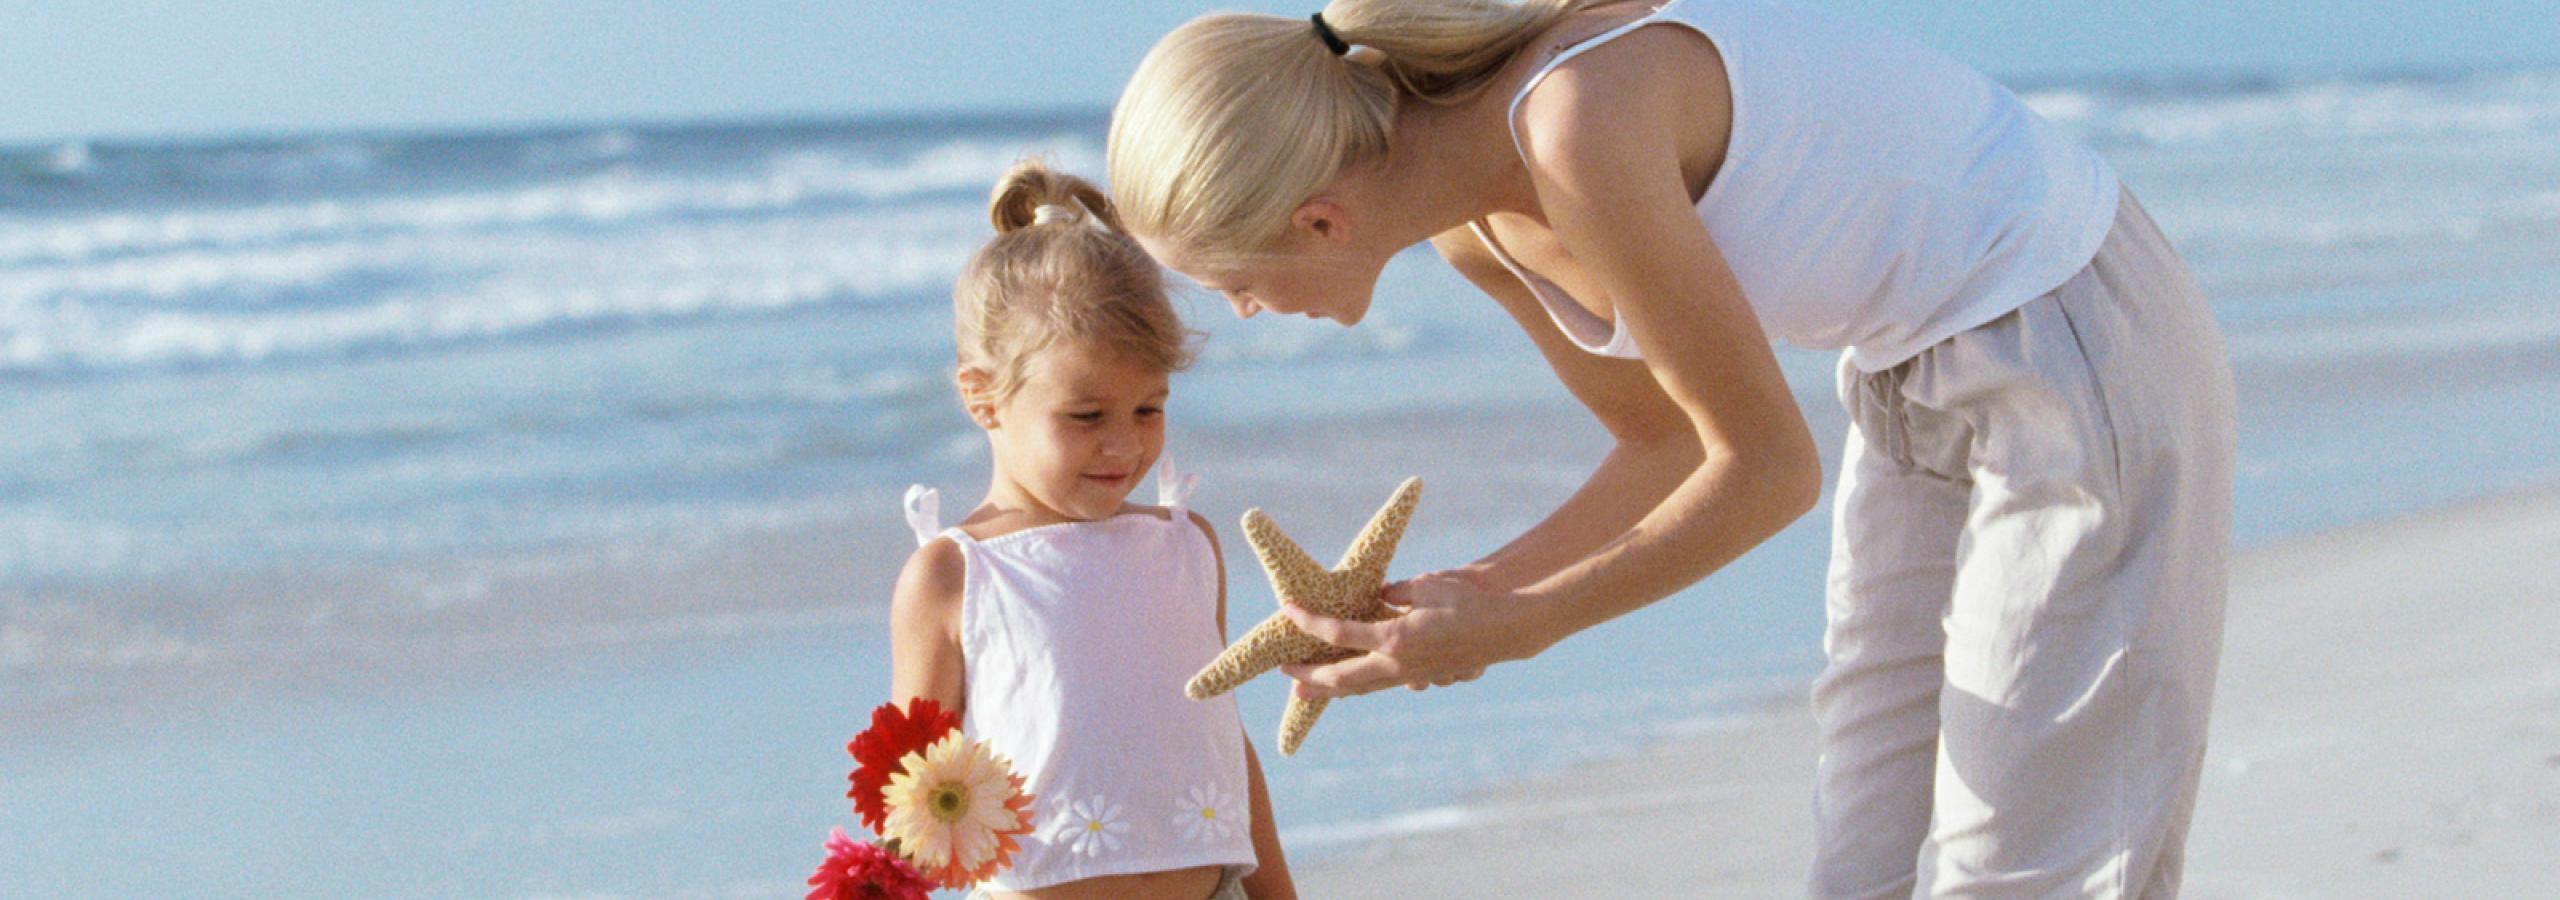 Destination vacation hilton head island hilton head for Mother daughter vacation destinations